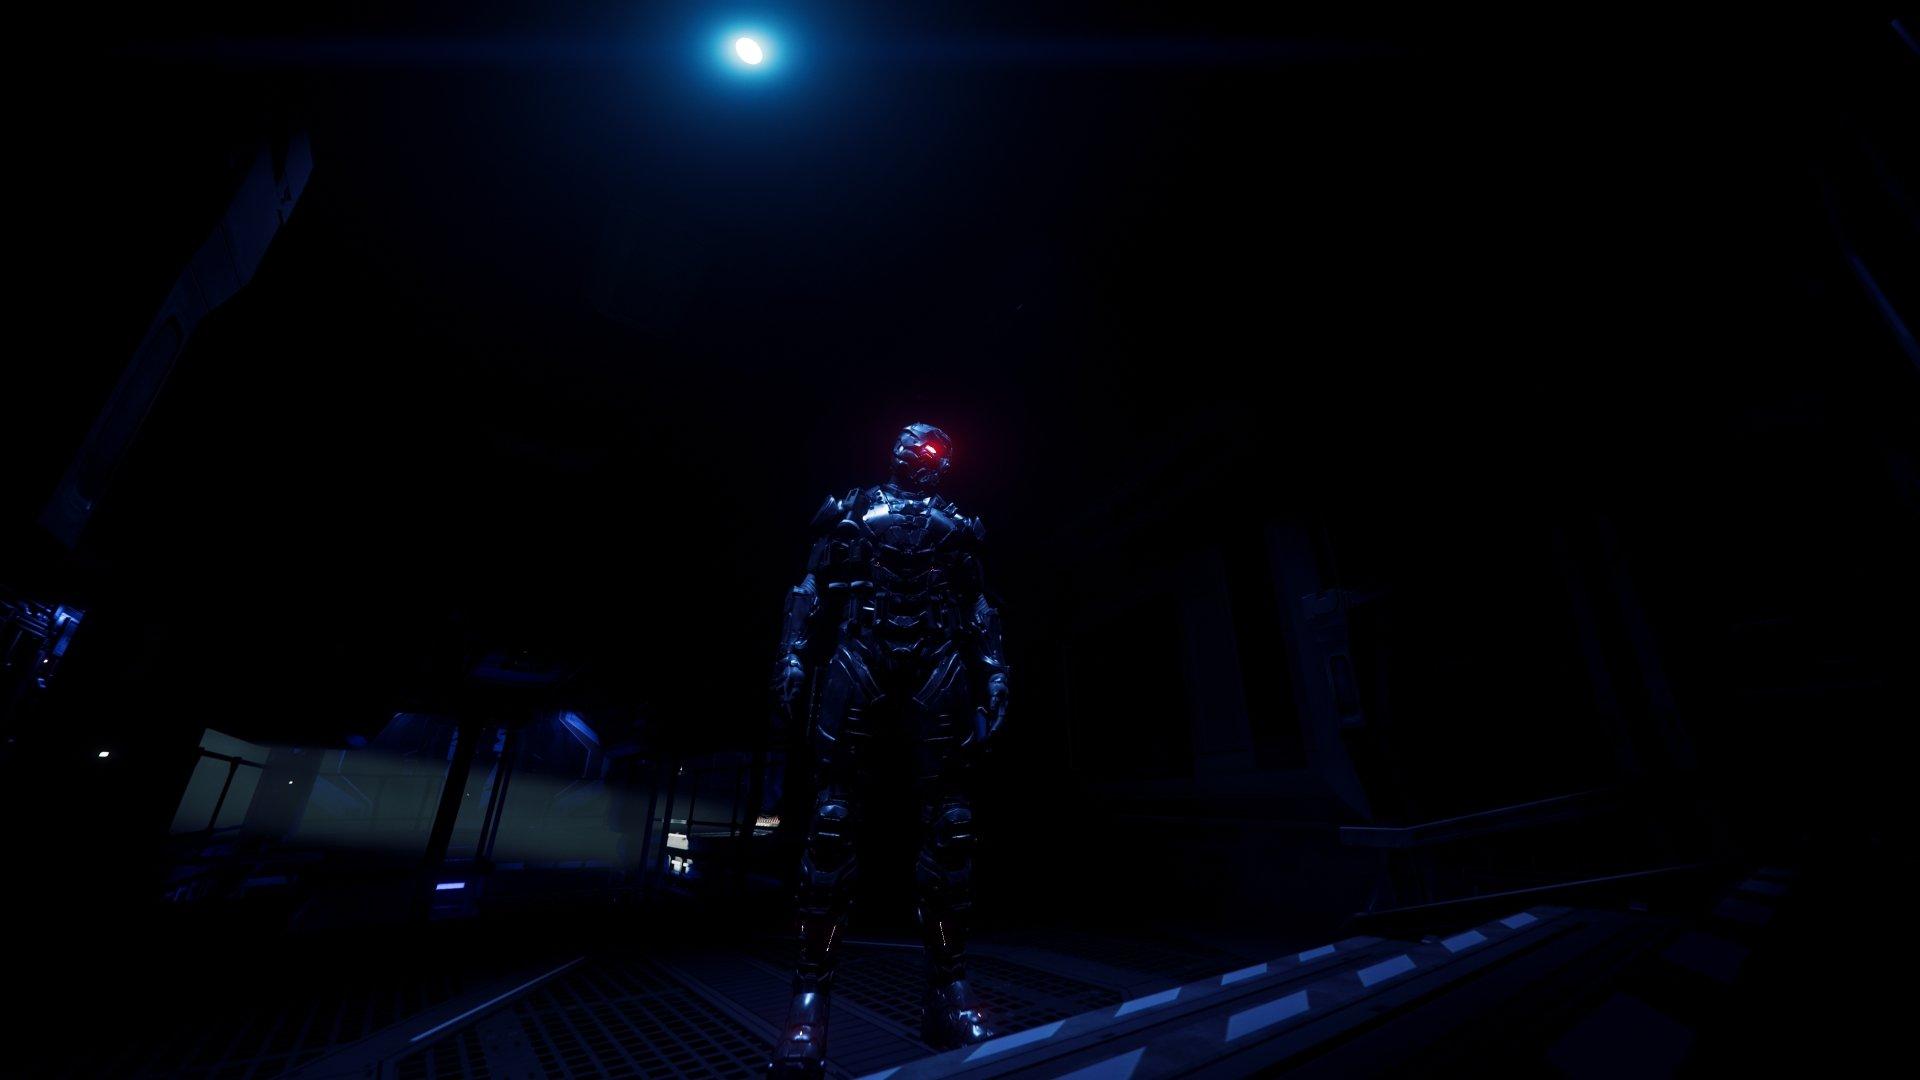 Video Game - Star Citizen  Armor Wallpaper